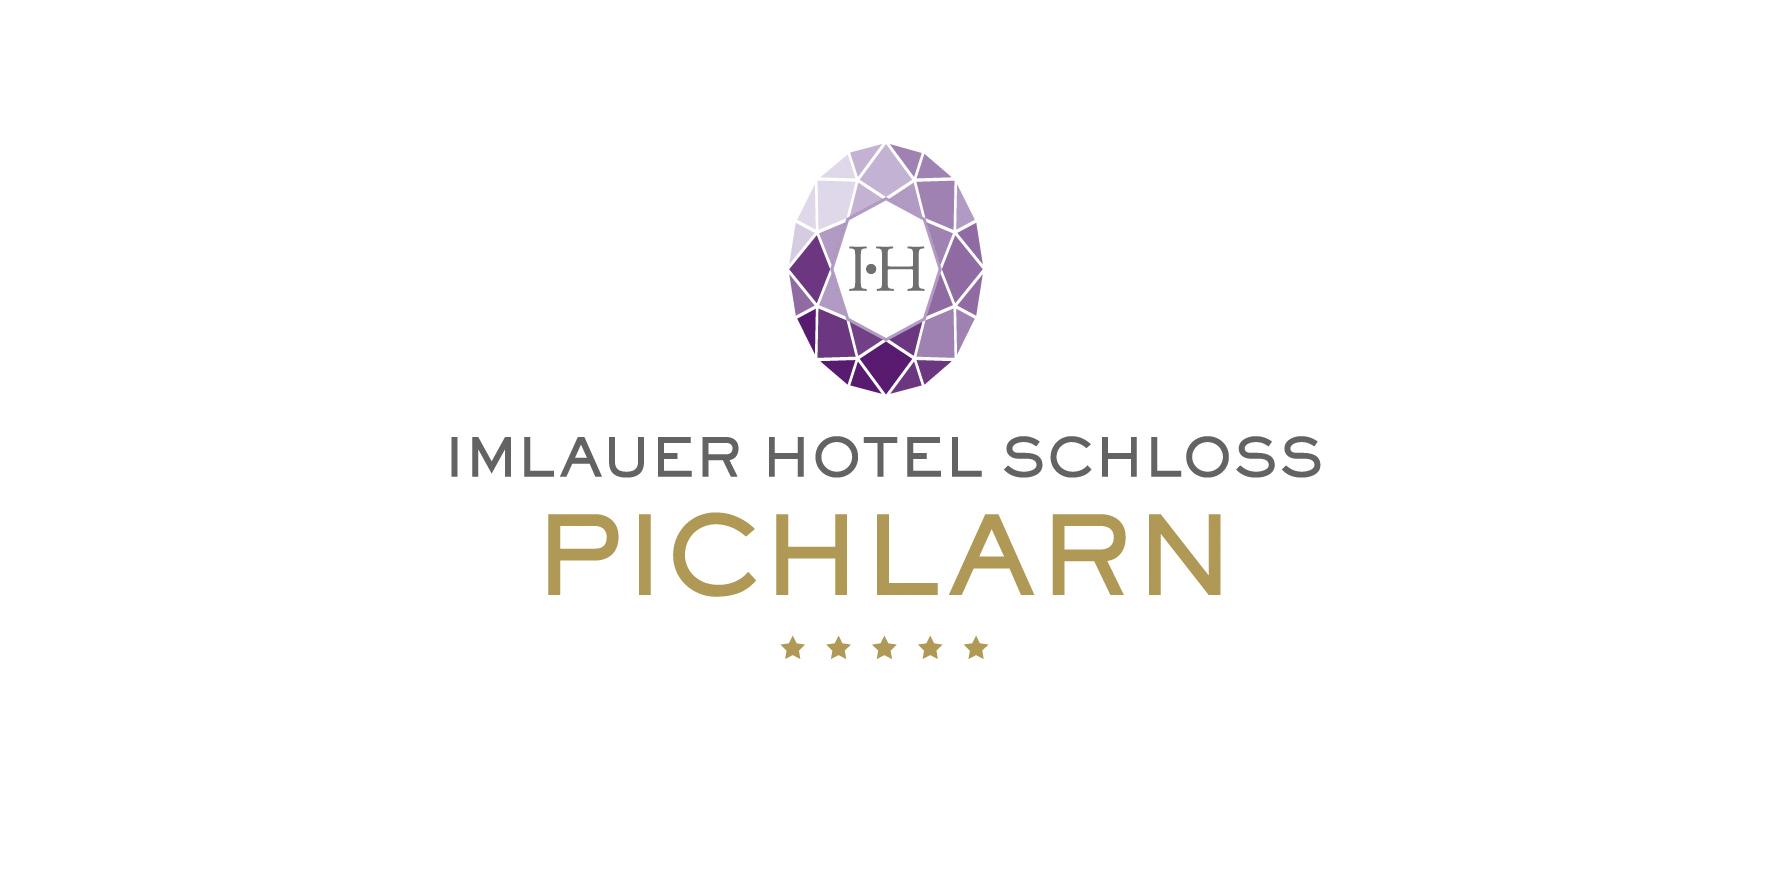 IH_Schloss_Pichlarn_A_zentriert_rgb